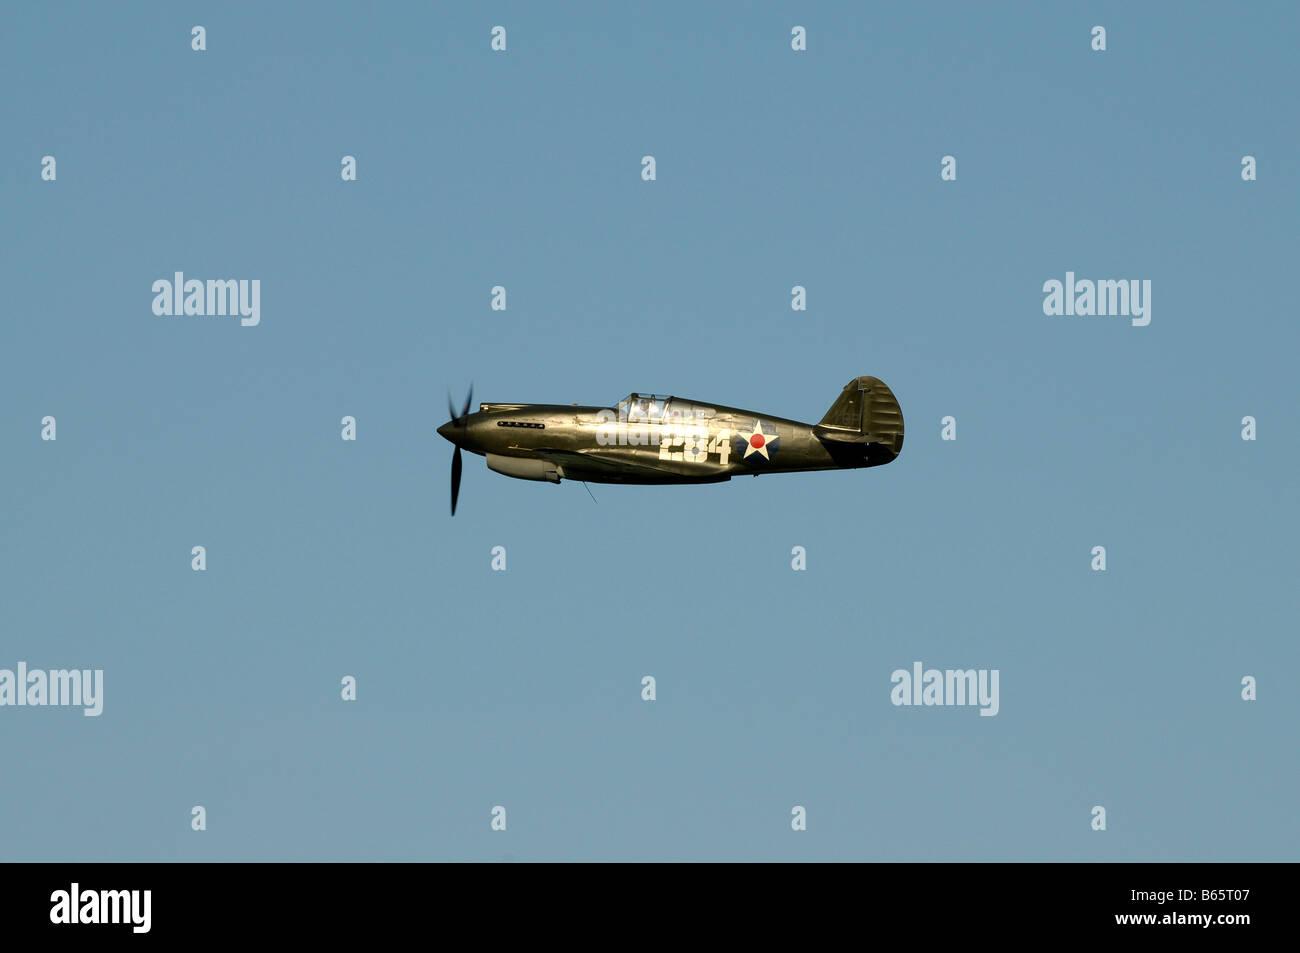 Curtiss P40B Warhawk Kittyhawk 1941 - Stock Image